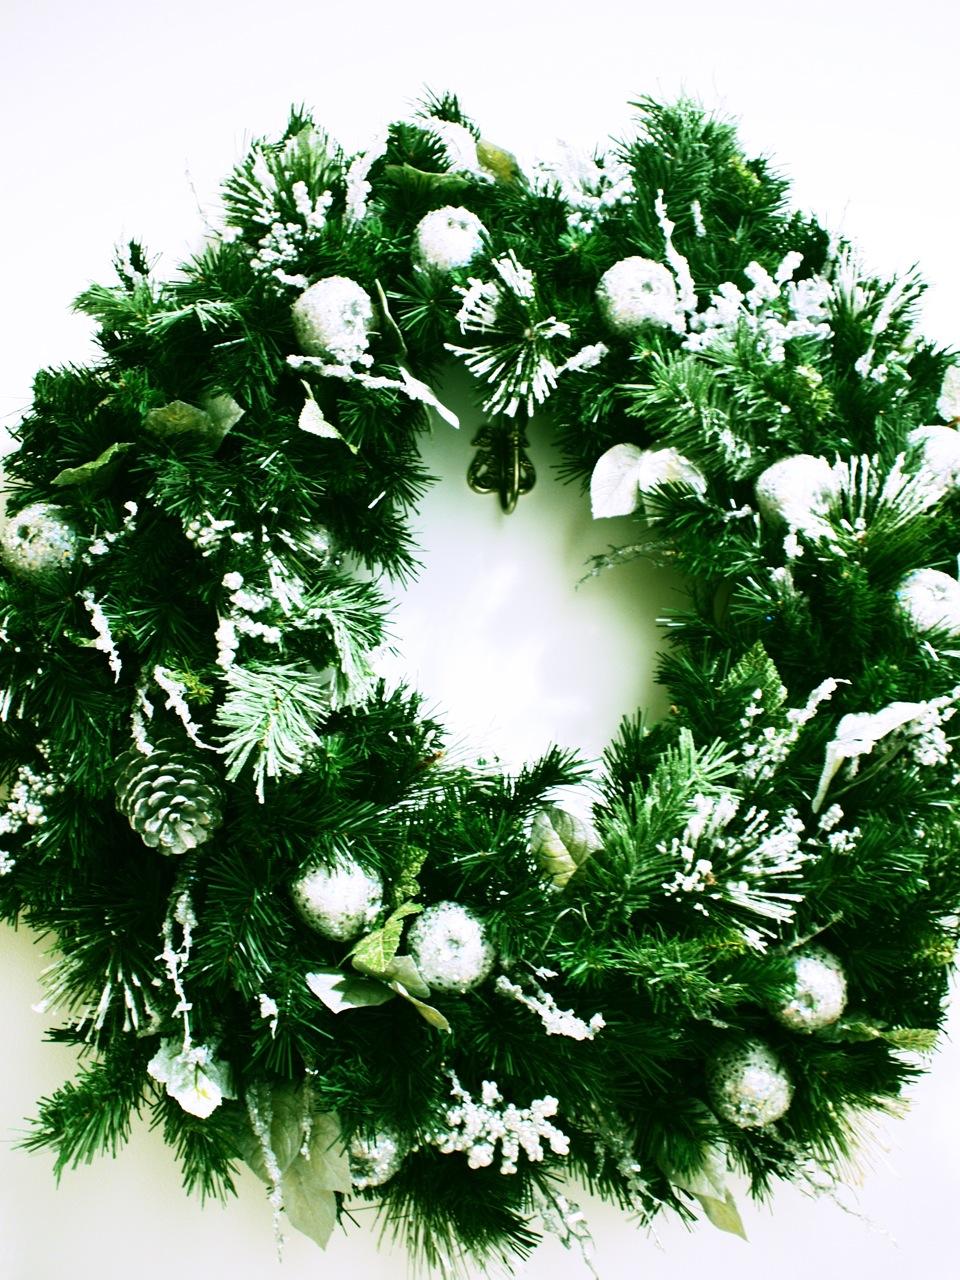 Merry Christmas_c0175022_2512582.jpg